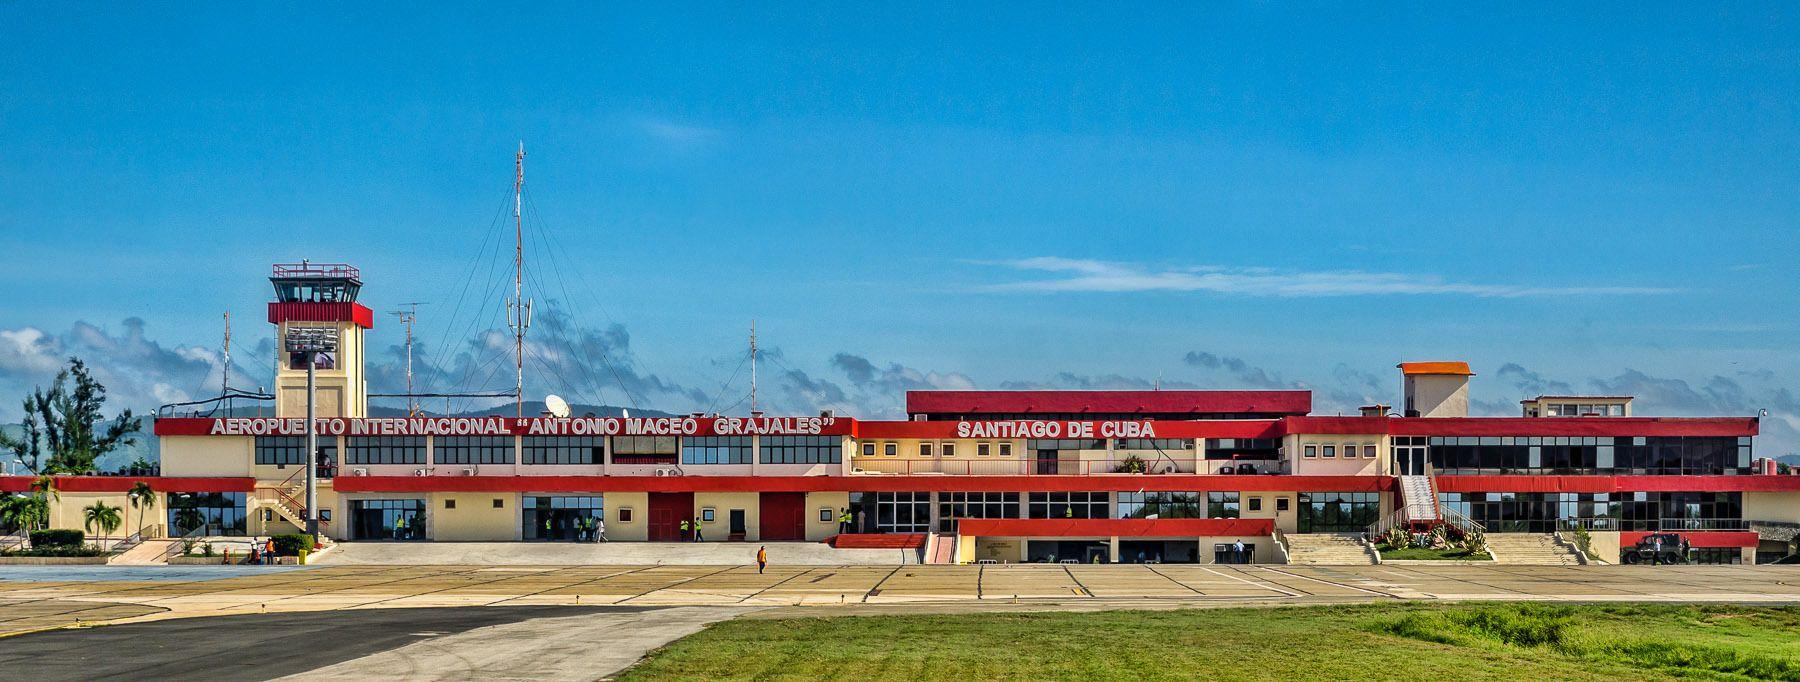 Santiago airport.  Santiago de Cuba